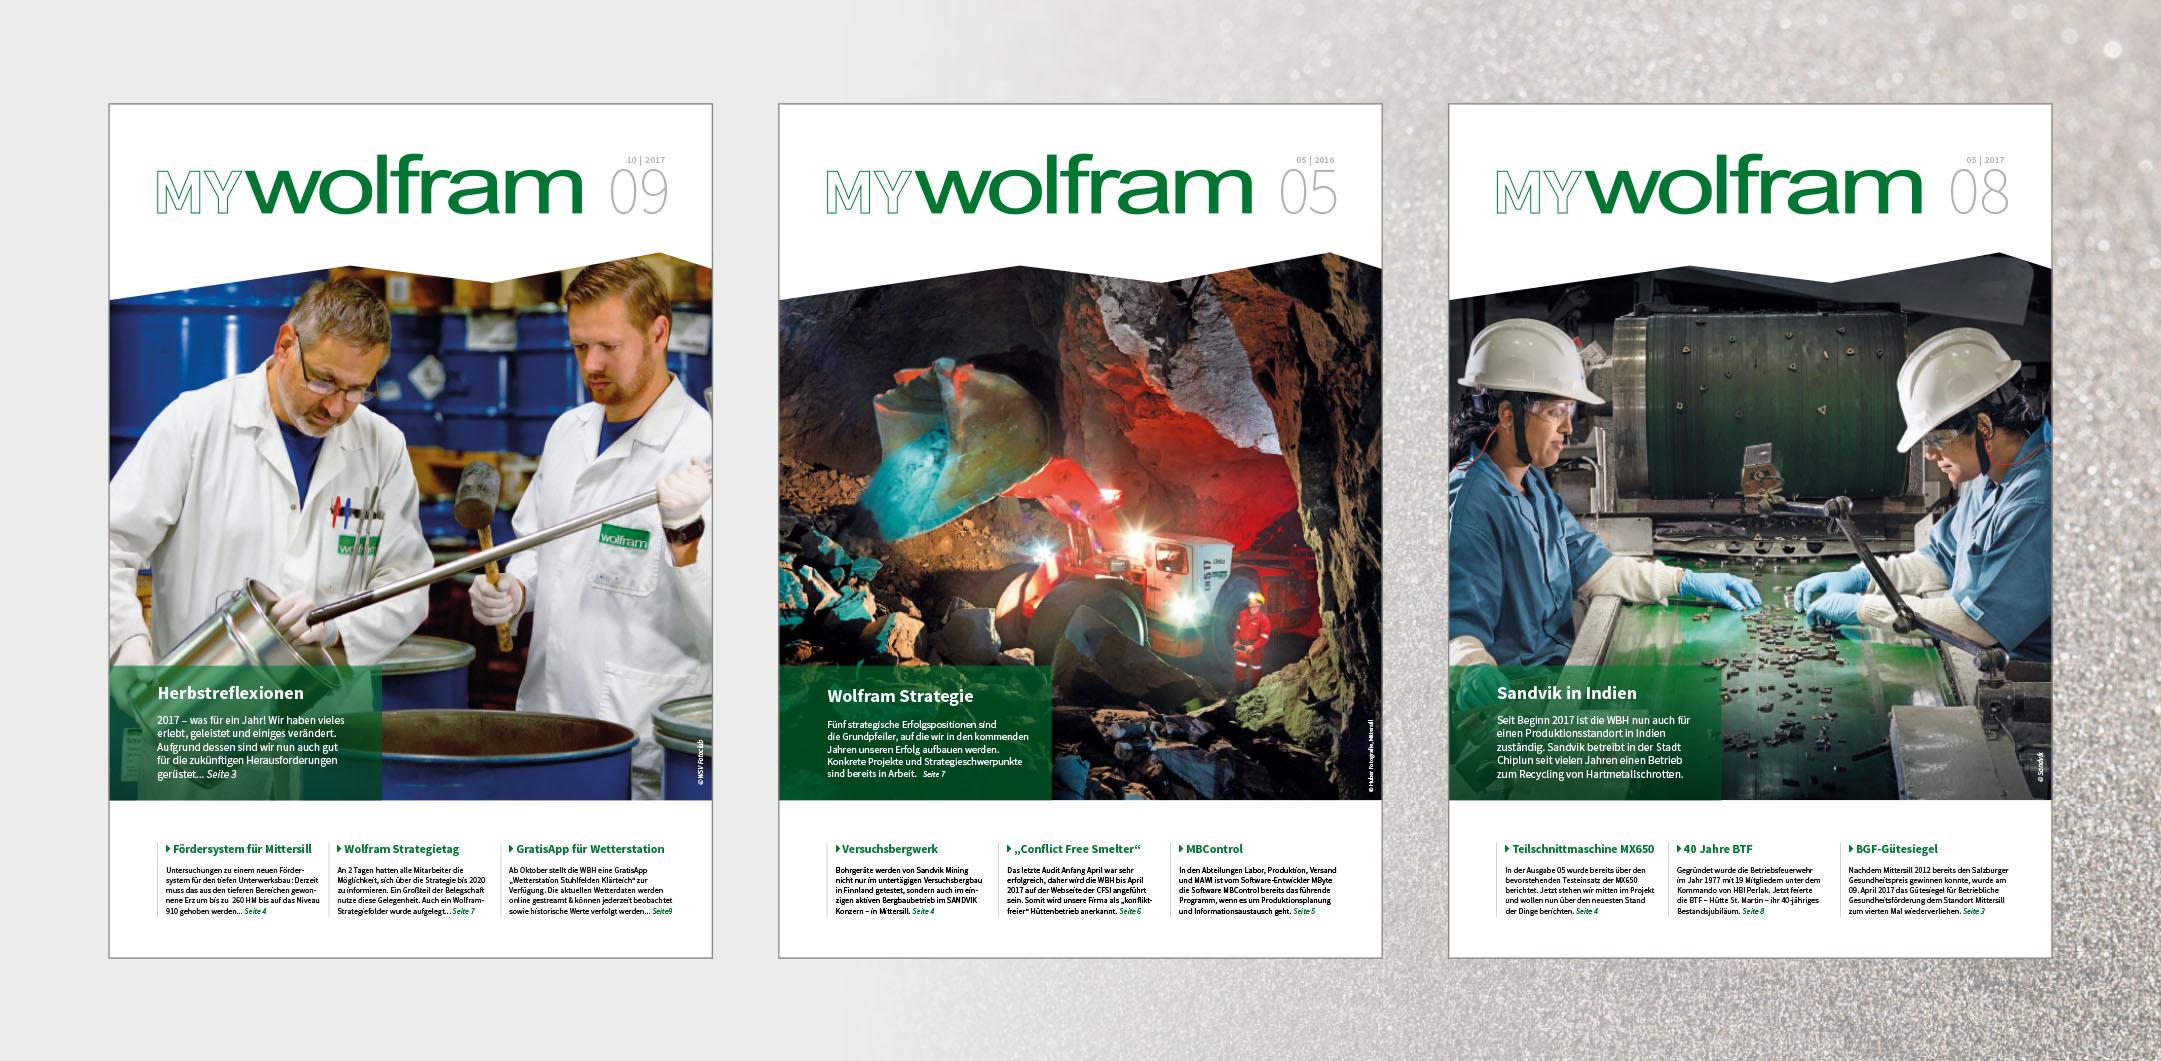 Wolfram-02